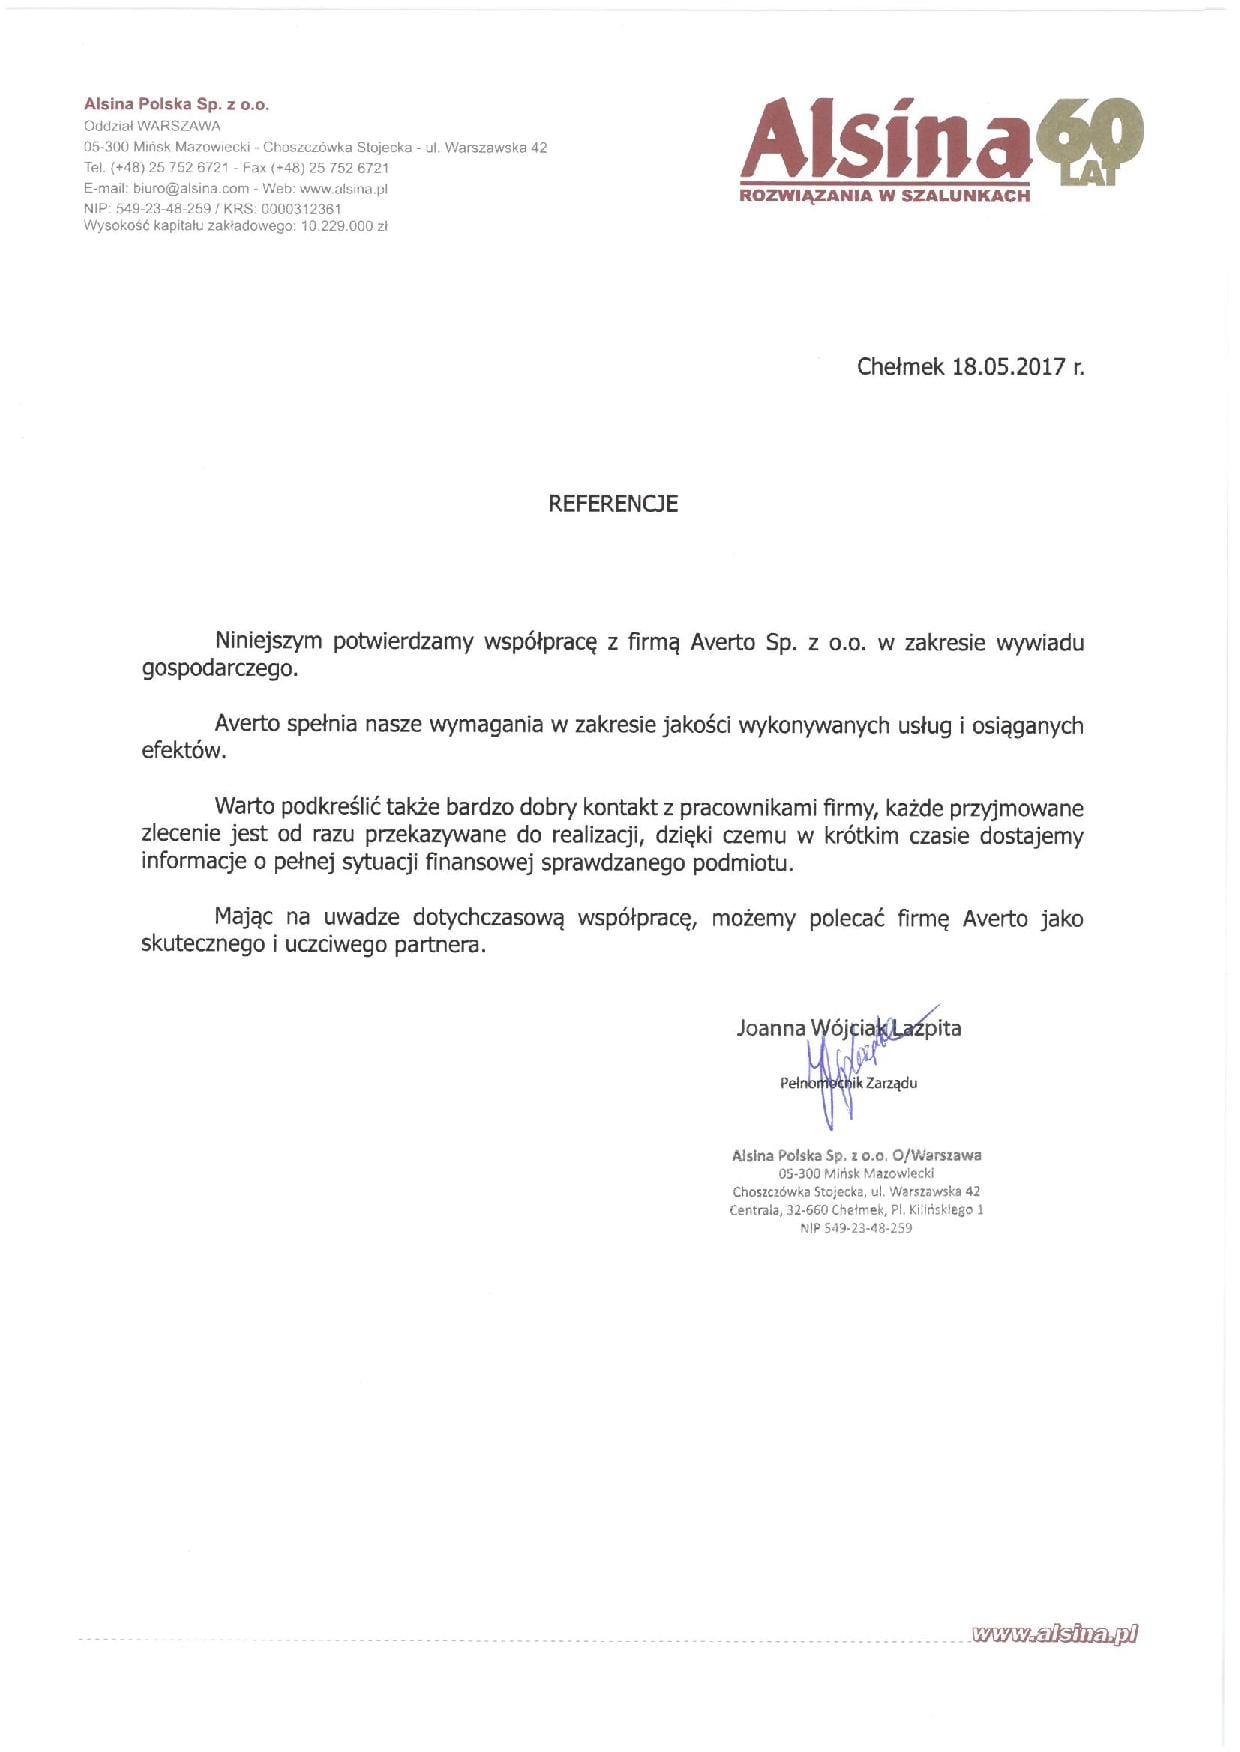 Referencja od Alsina Polska Sp. z o.o.